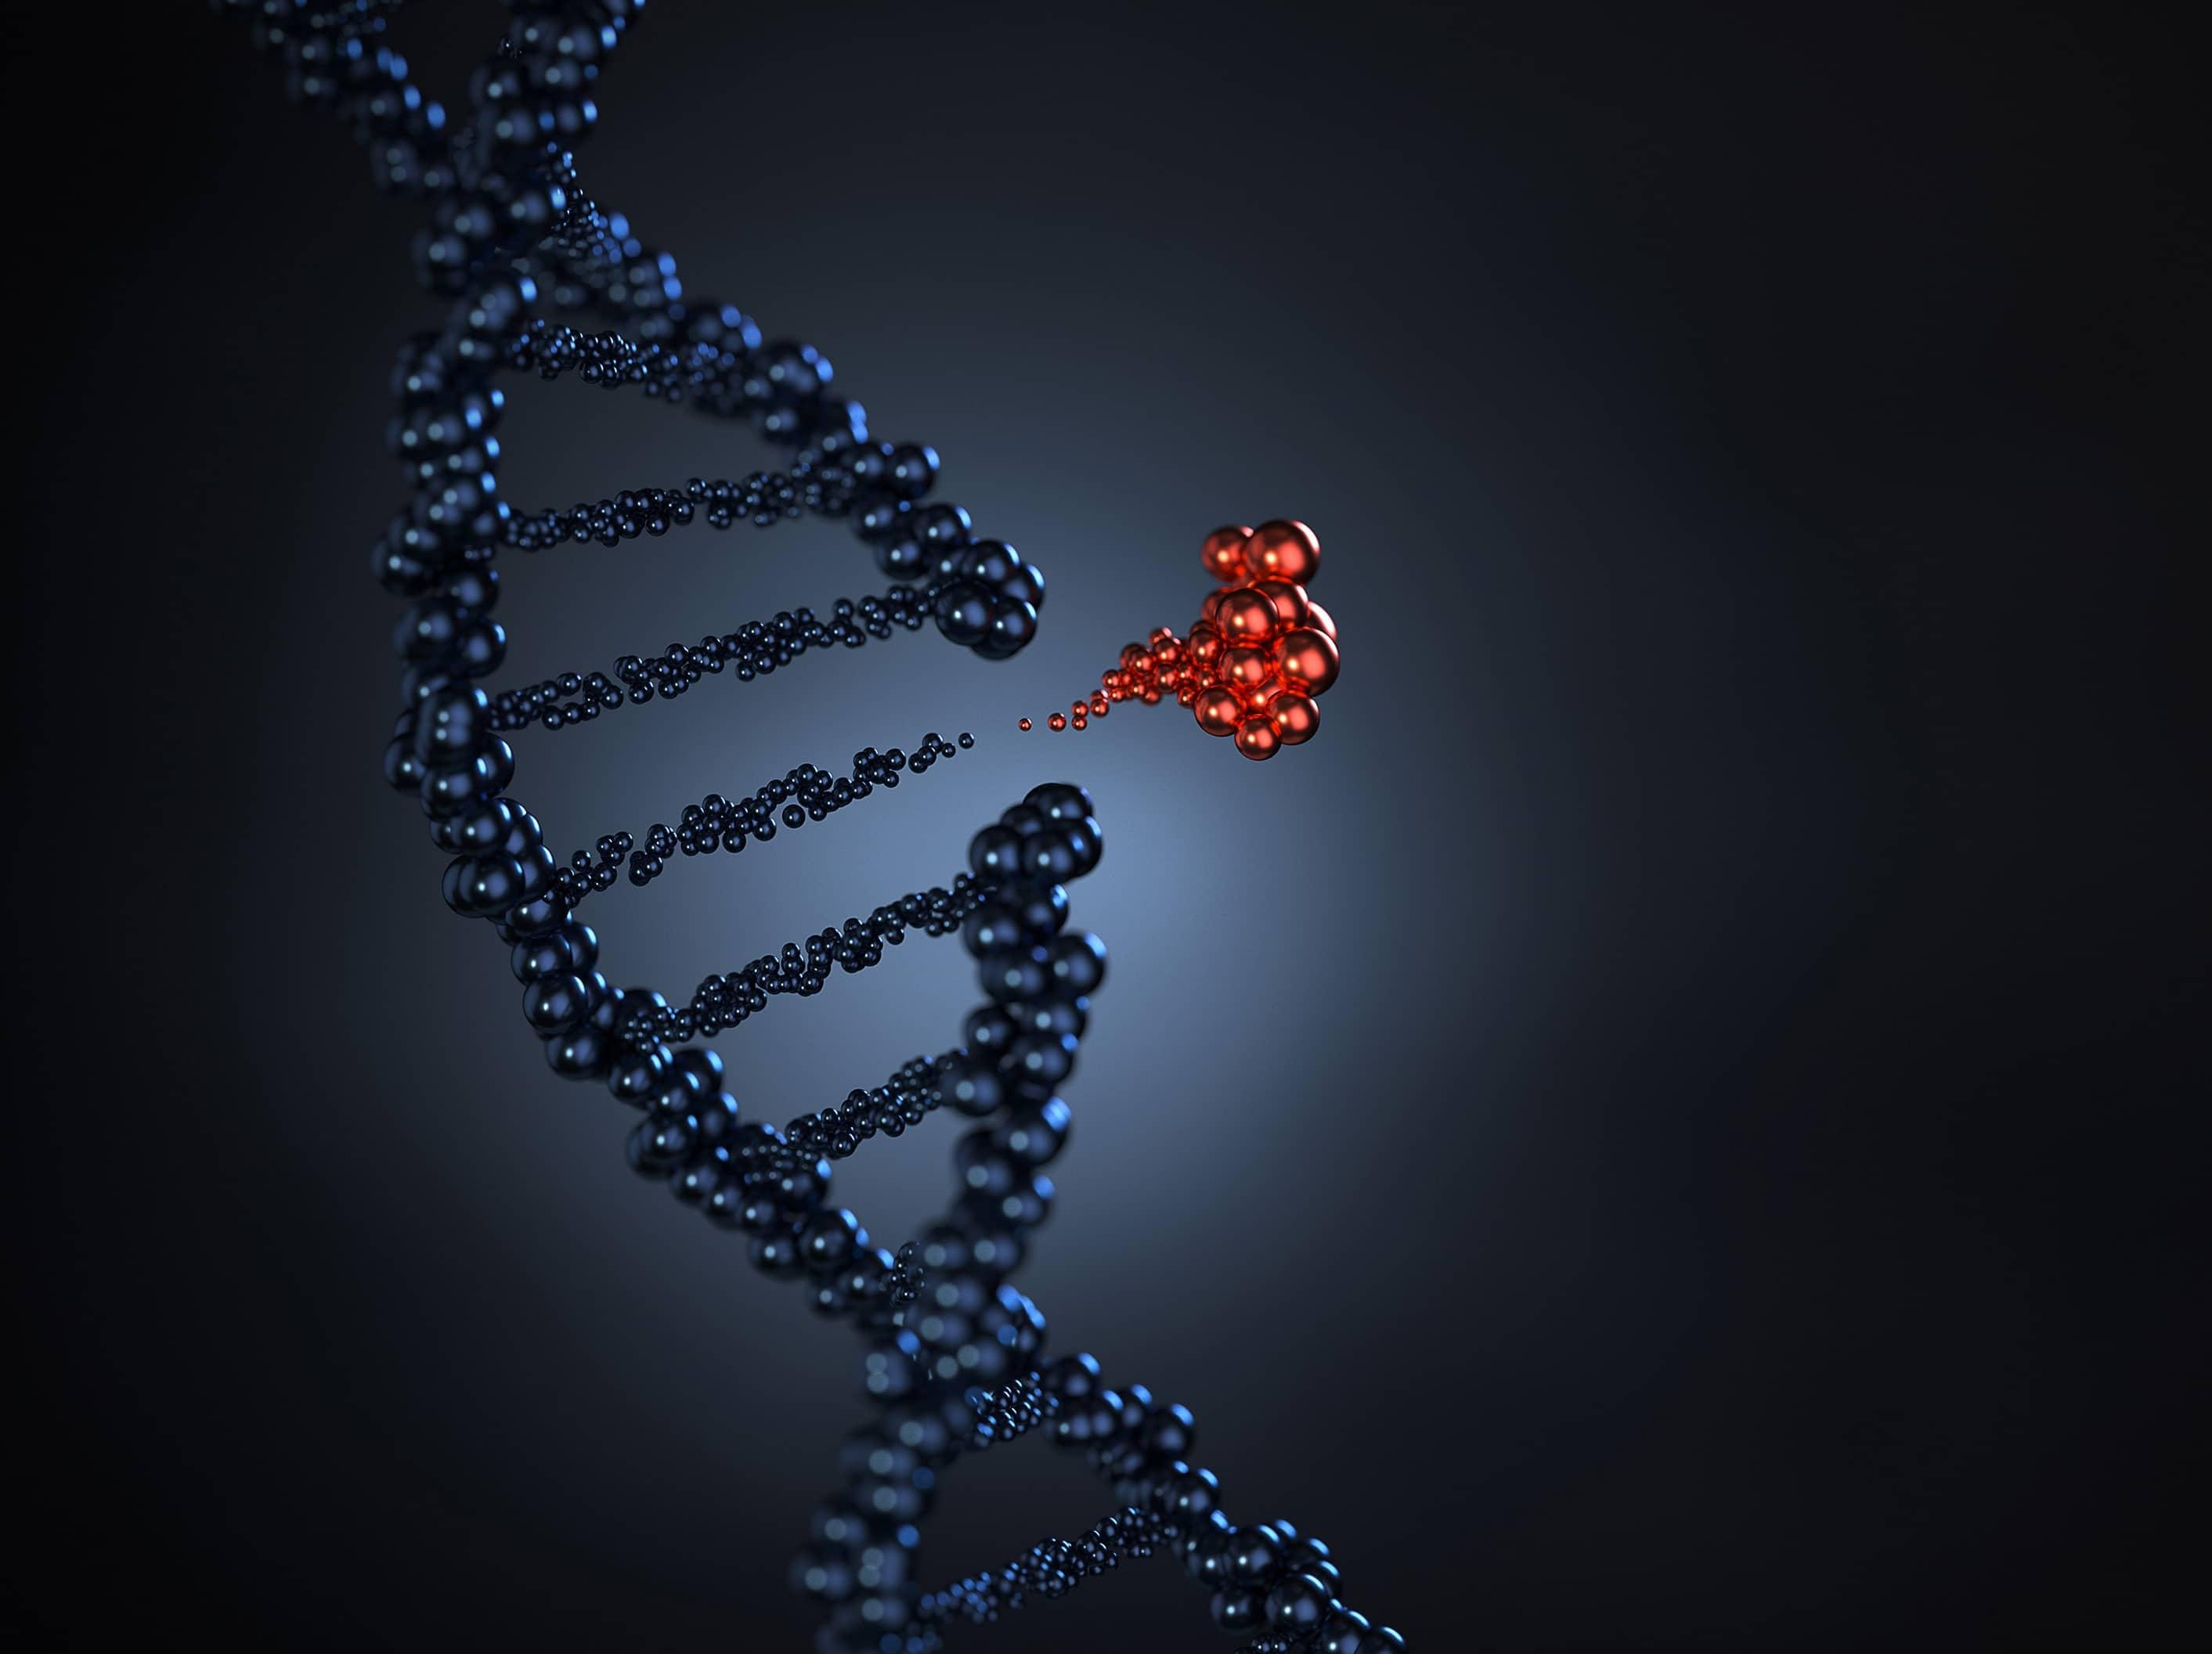 A Gene-Editing First: Scientists Tried Crispr To Fight HIV